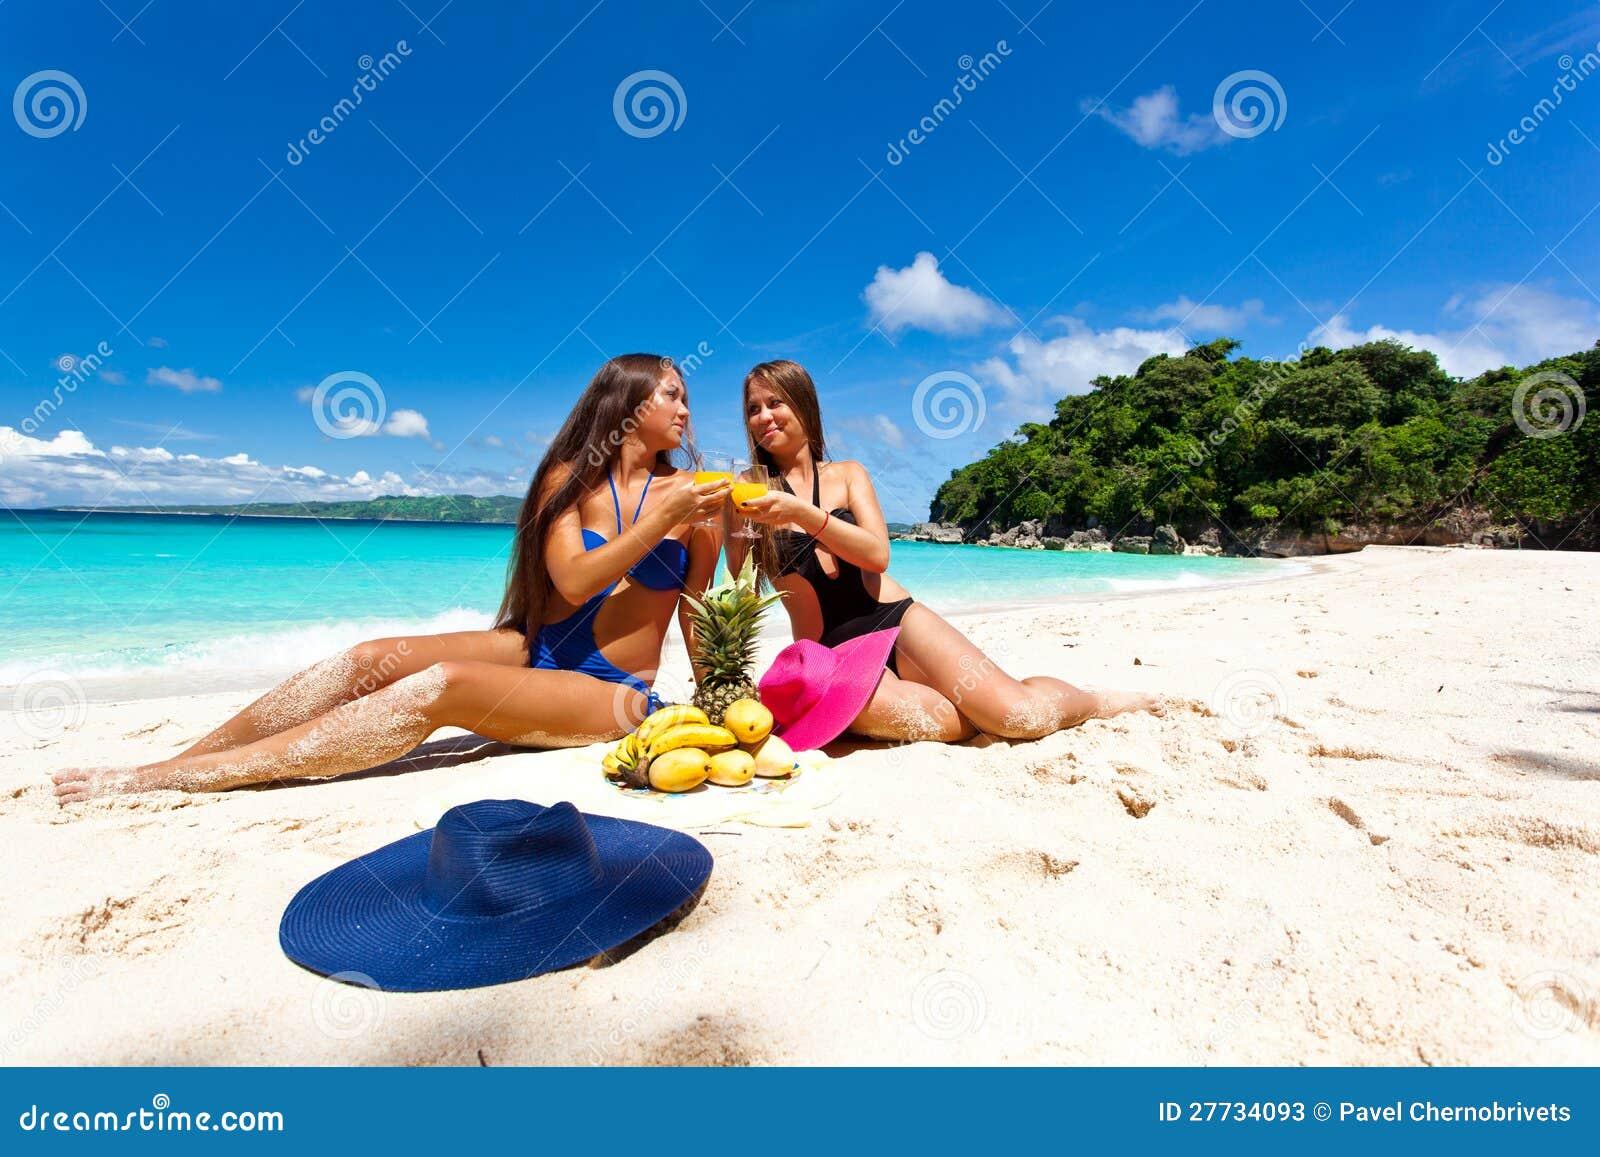 Picknick auf Sommerstrand